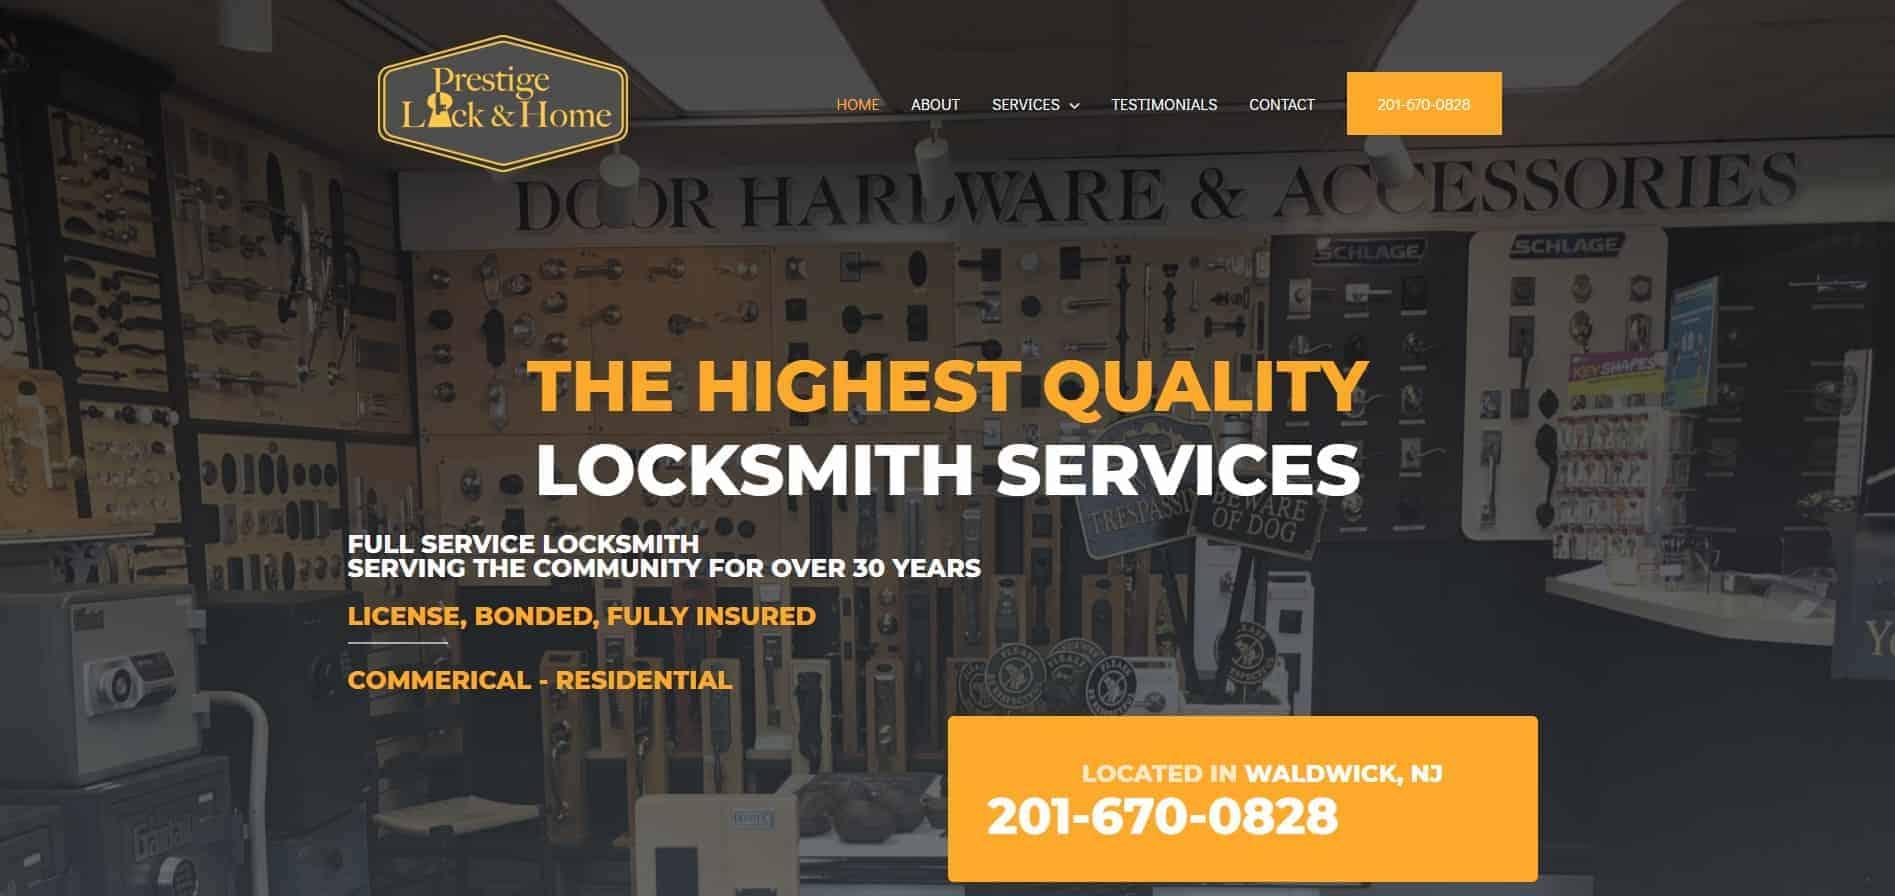 prestige lock and home